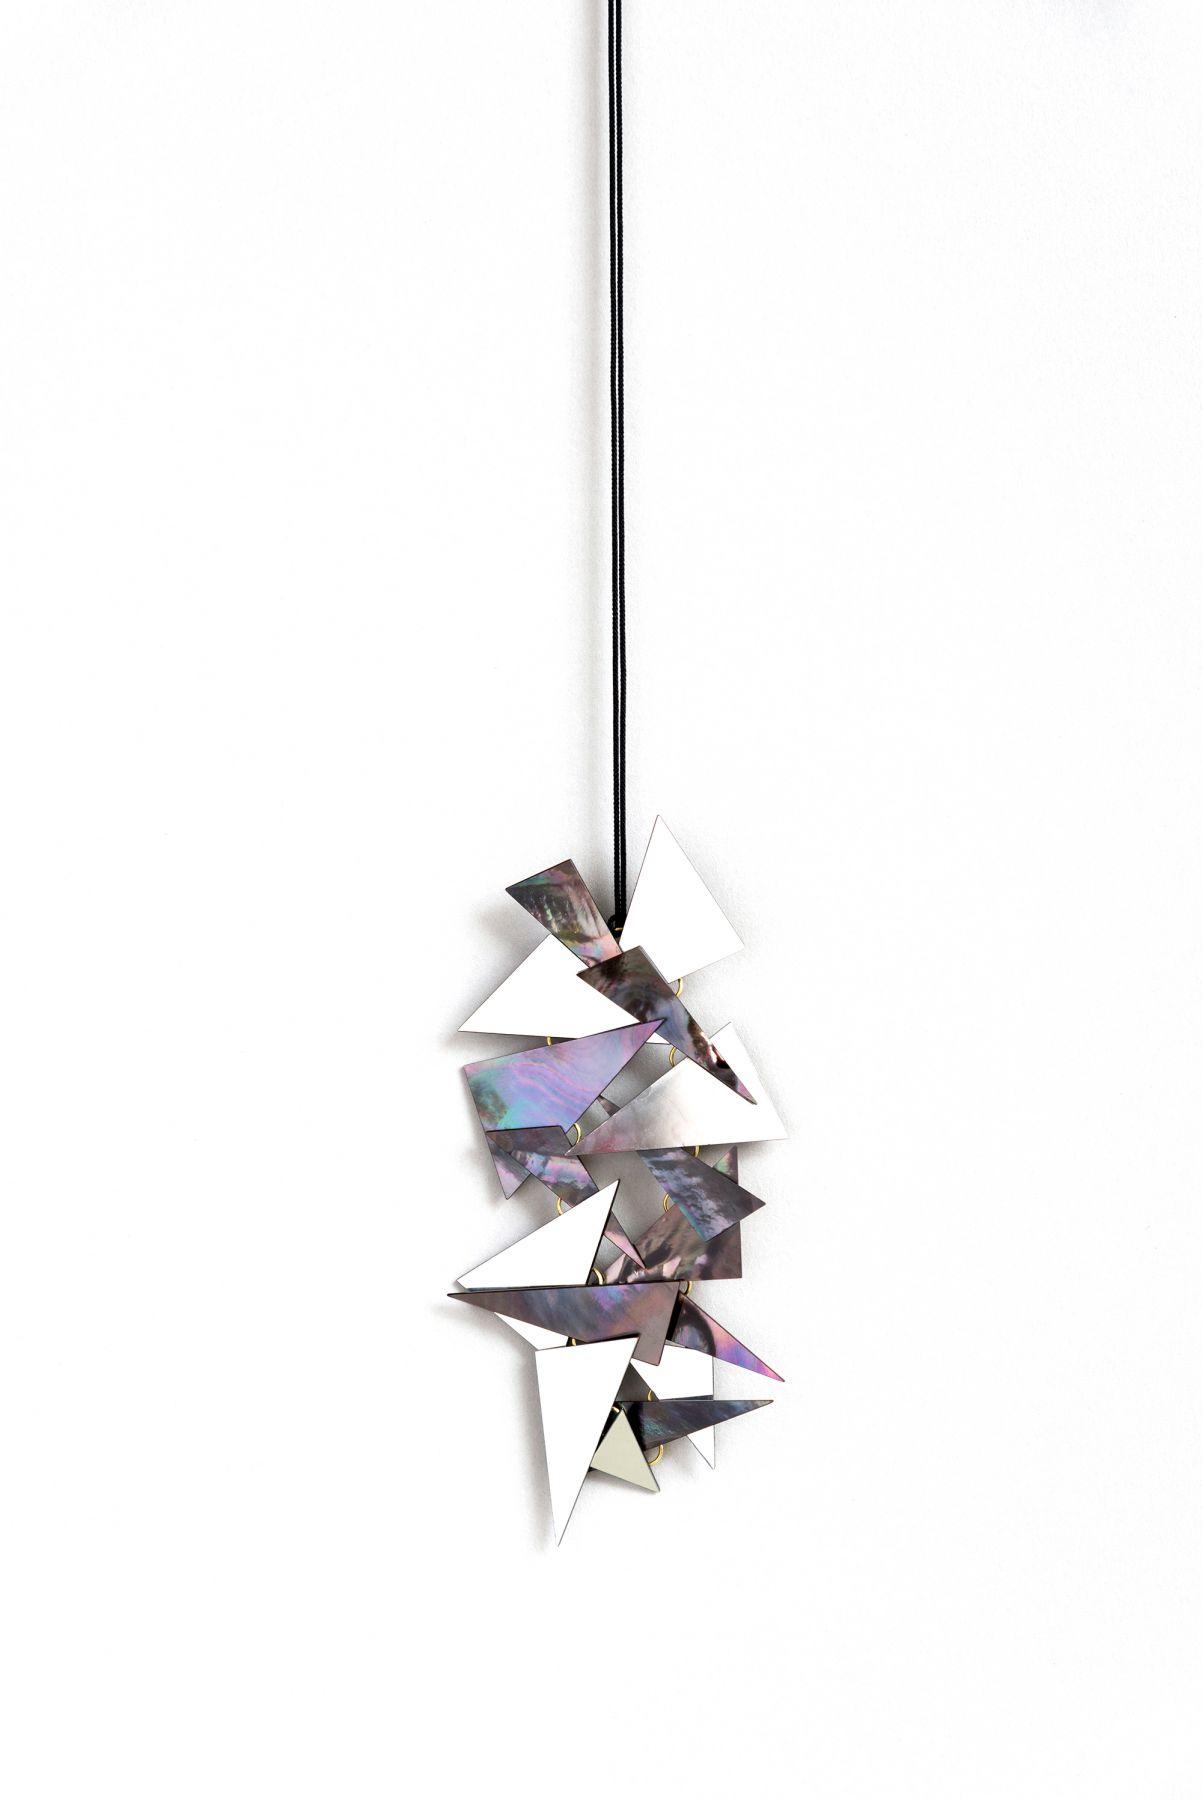 Jiro Kamata, pendant, mirror, shell